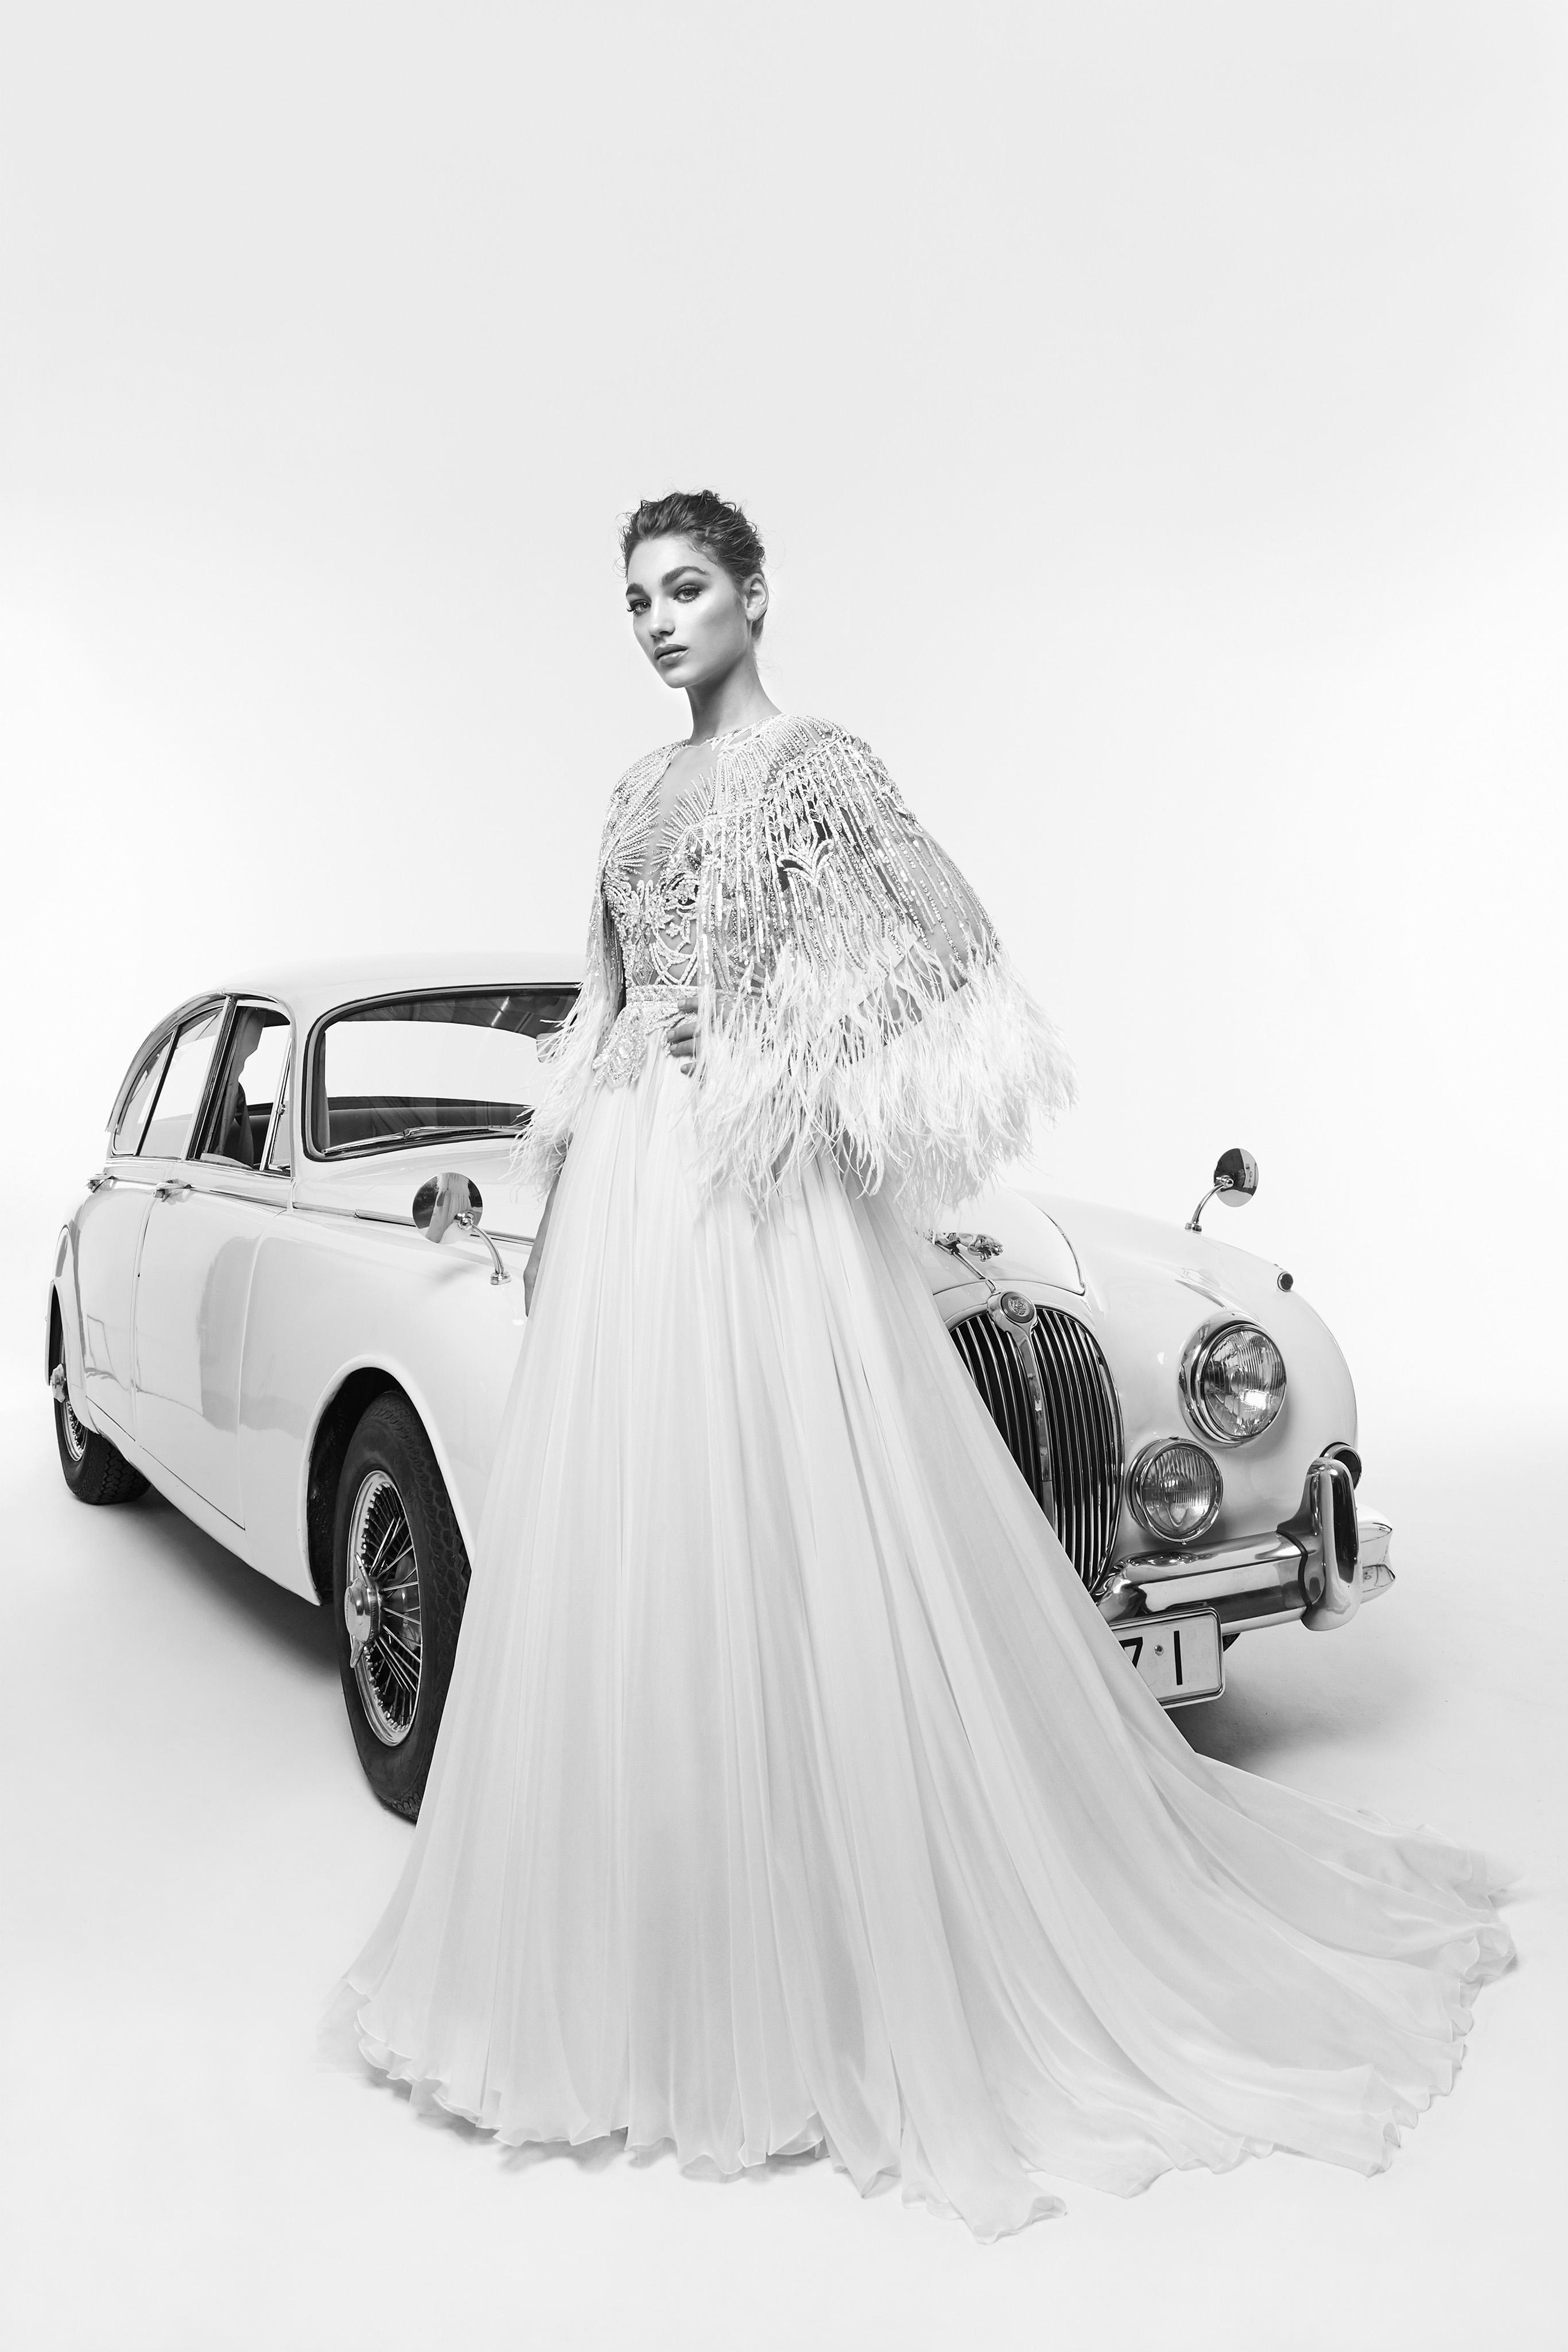 zuhair murad wedding dress spring 2019 feather wrap a-line